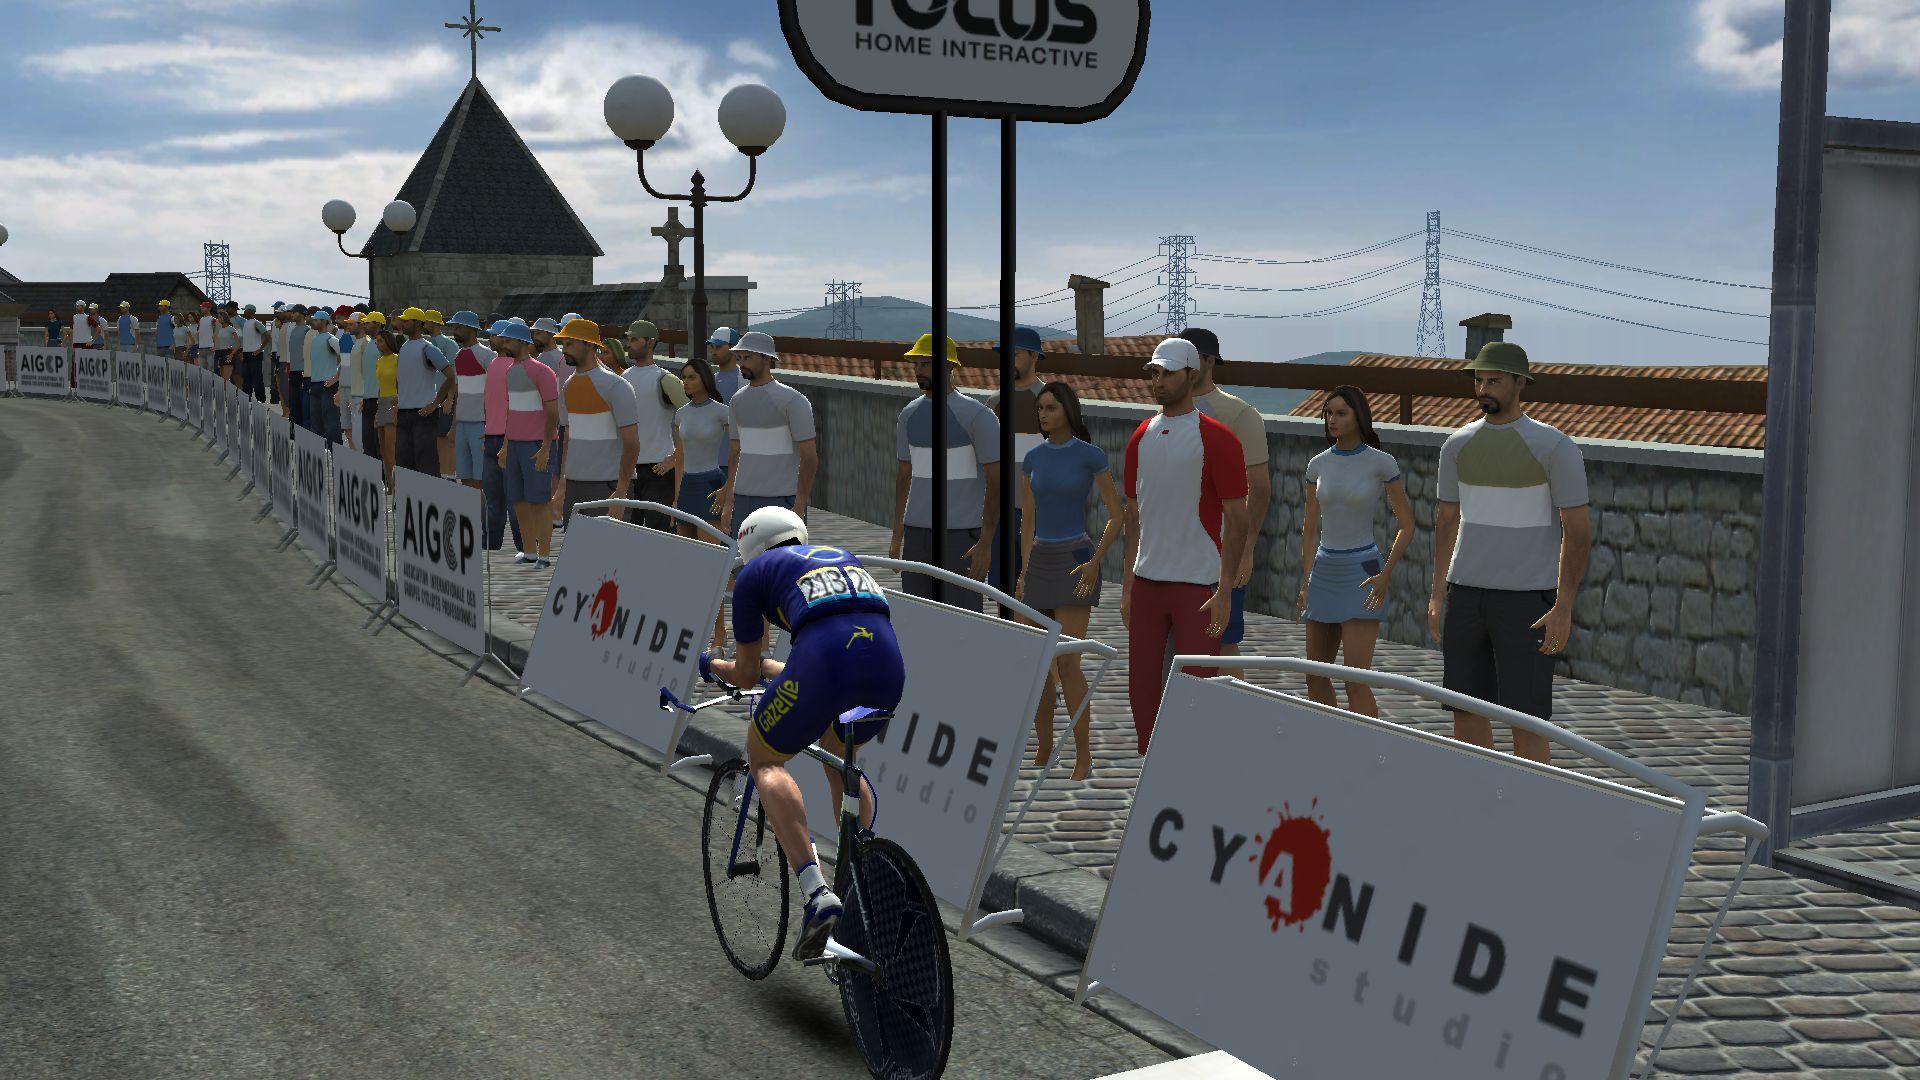 pcmdaily.com/images/mg/2019/Races/GTM/Giro/mg19_giro_09_PCM0006.jpg